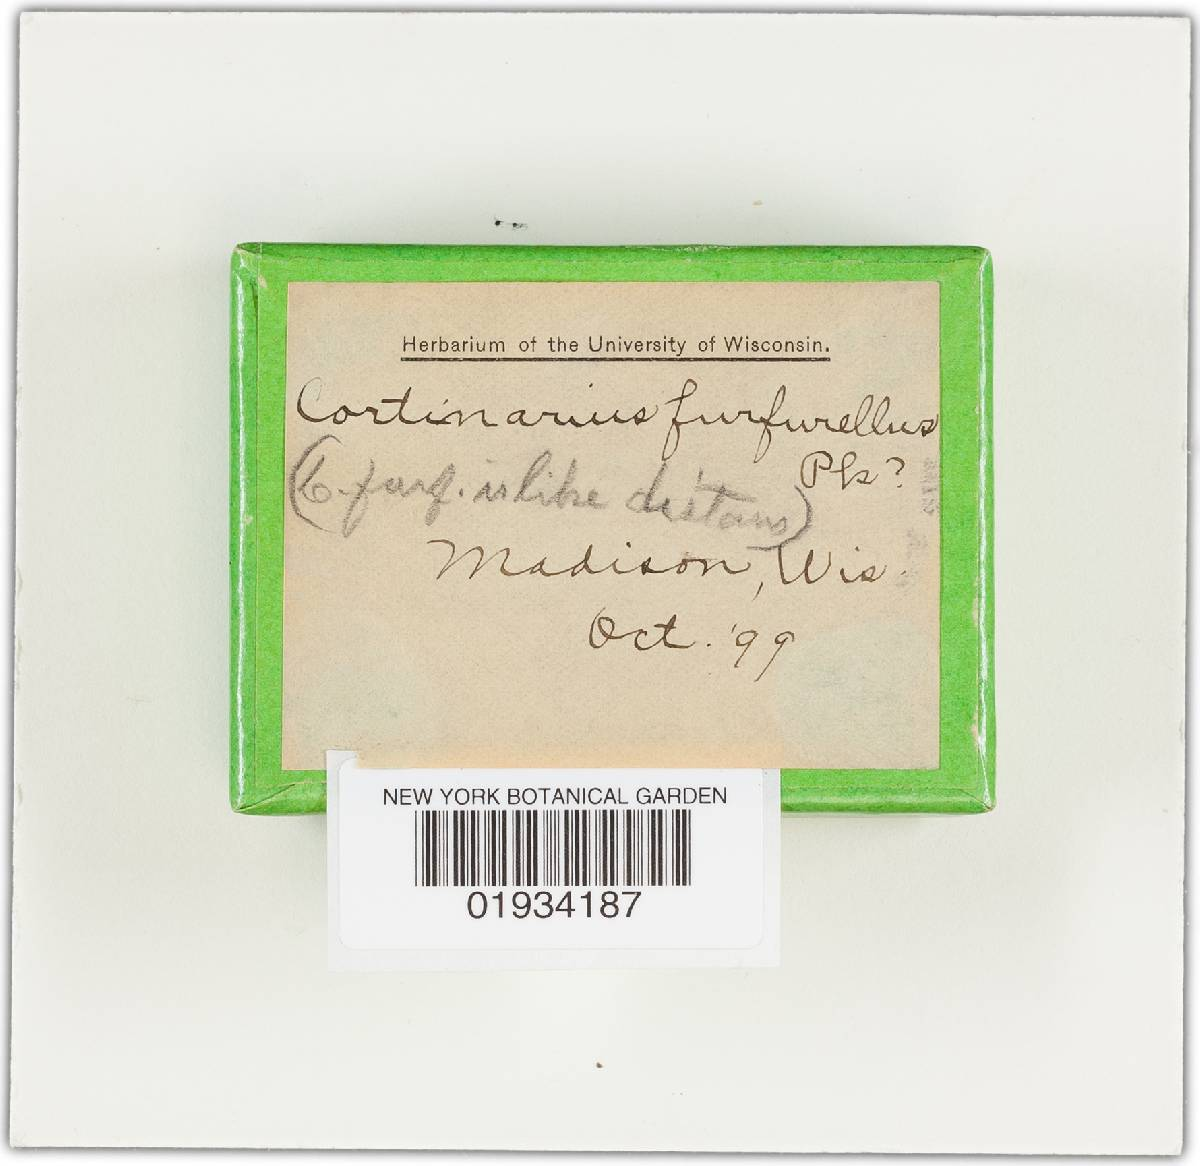 Cortinarius furfurellus image